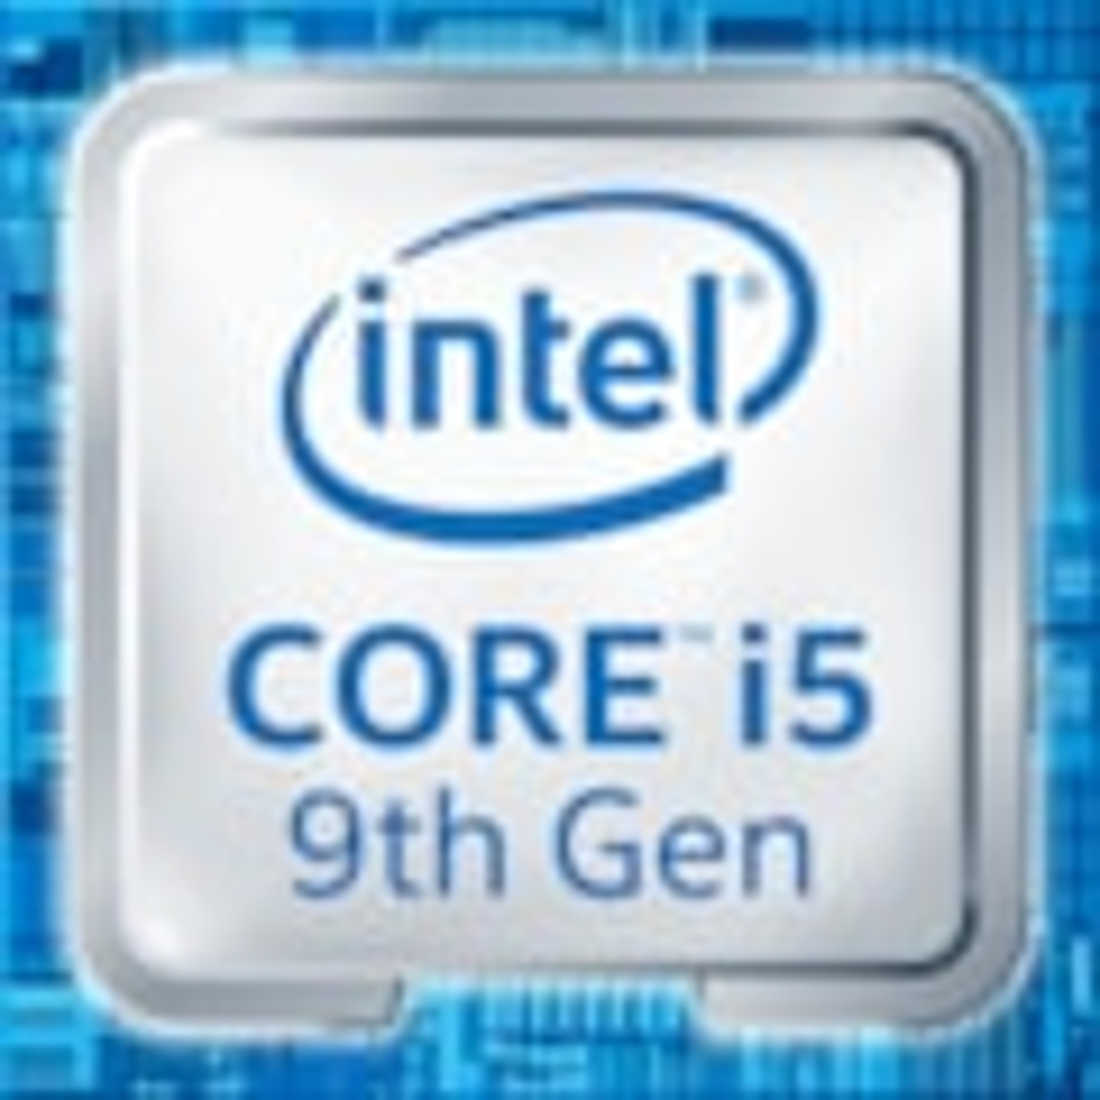 Intel Core i5 (9th Gen) i5-9500F Hexa-core (6 Core) 3 GHz Processor - Retail Pack